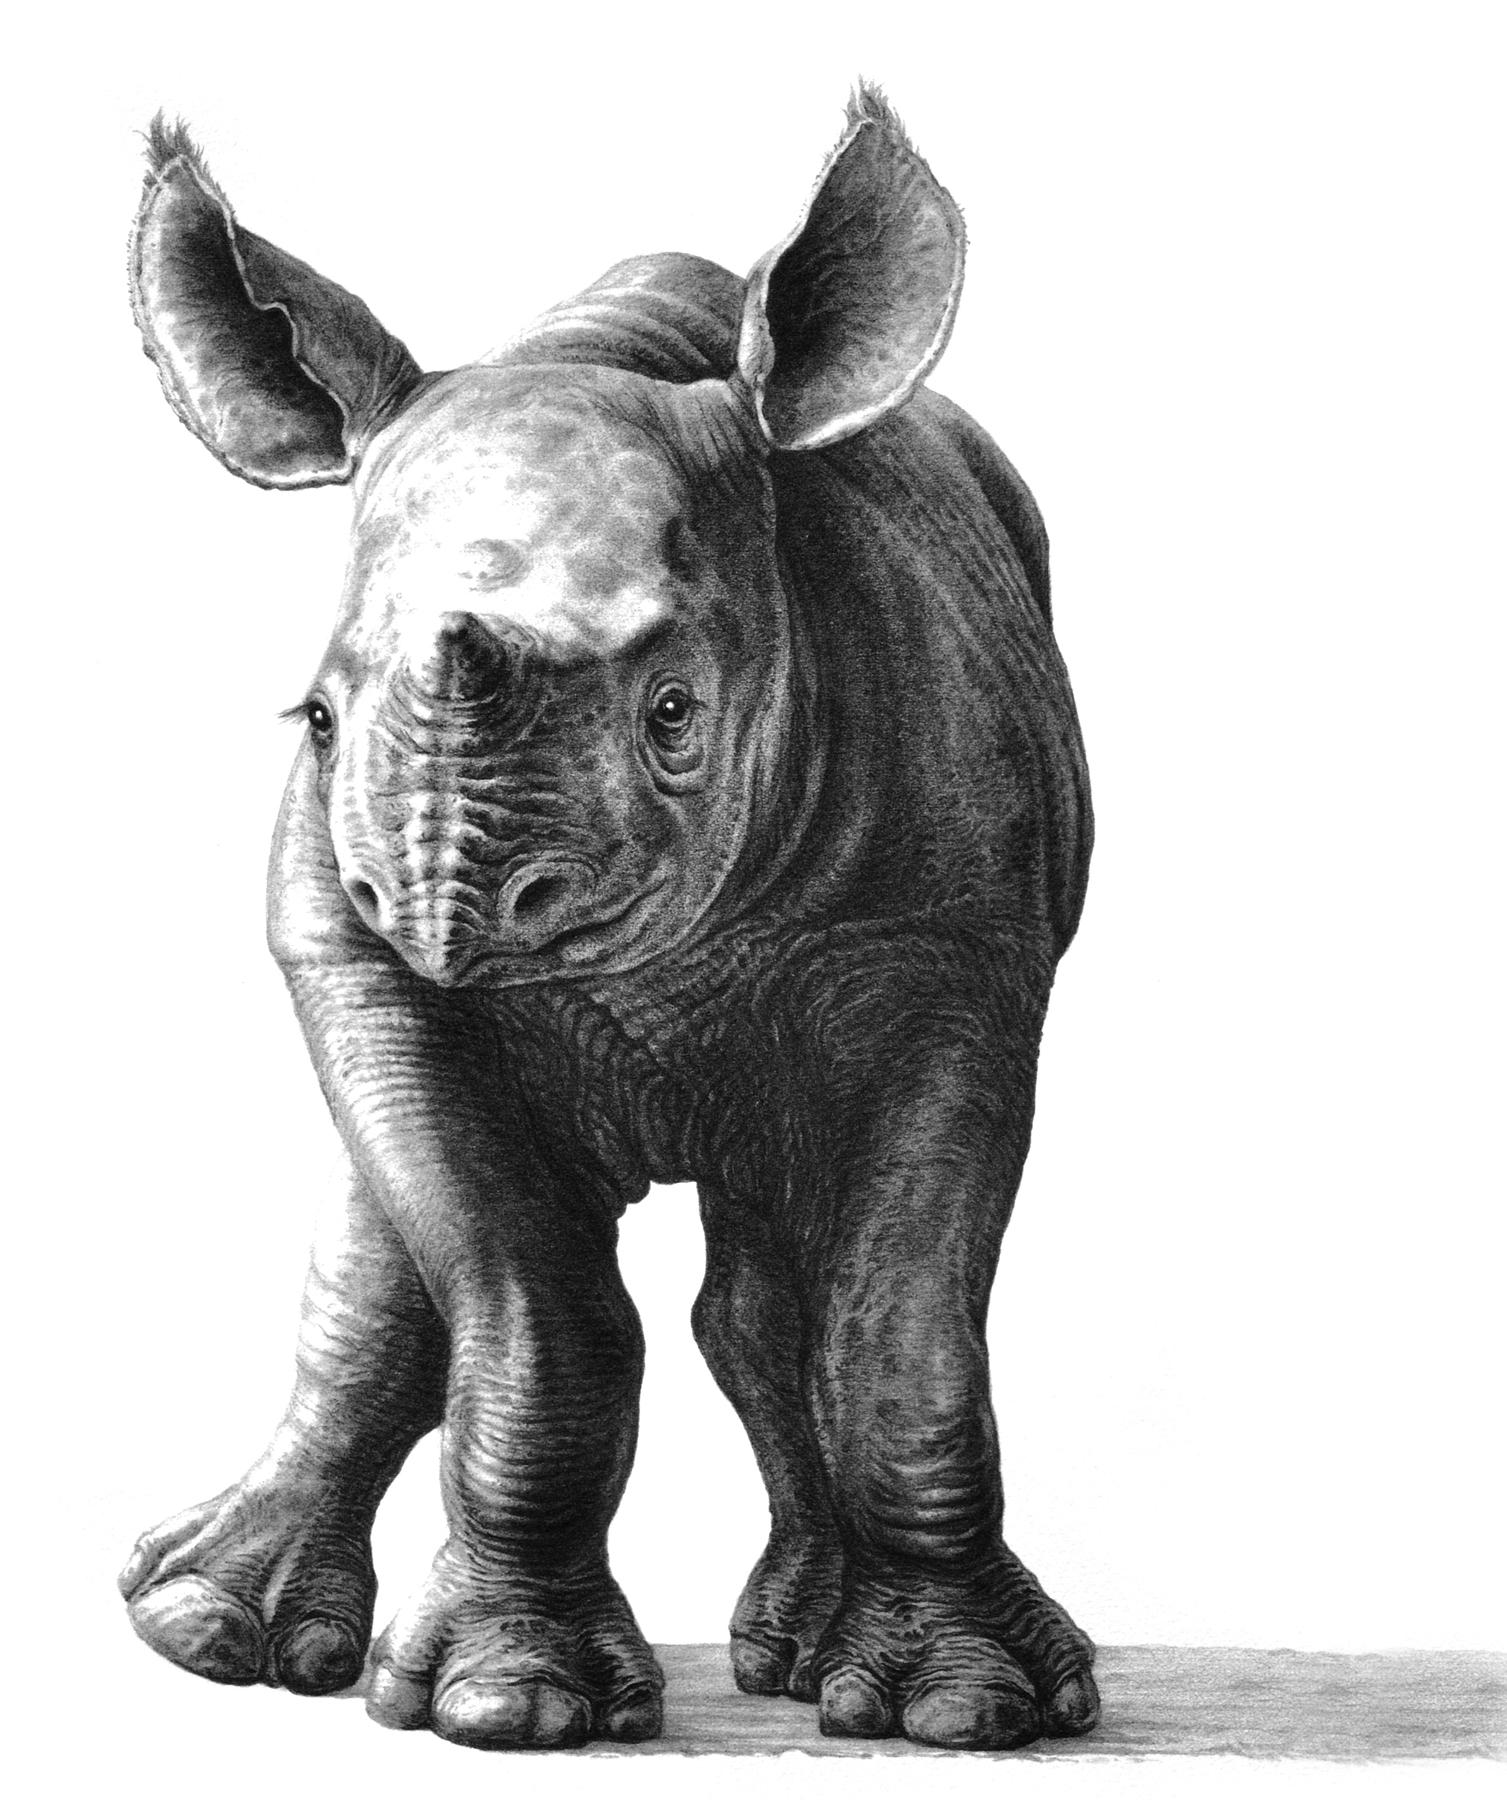 Wobbly 2000 (rhino)